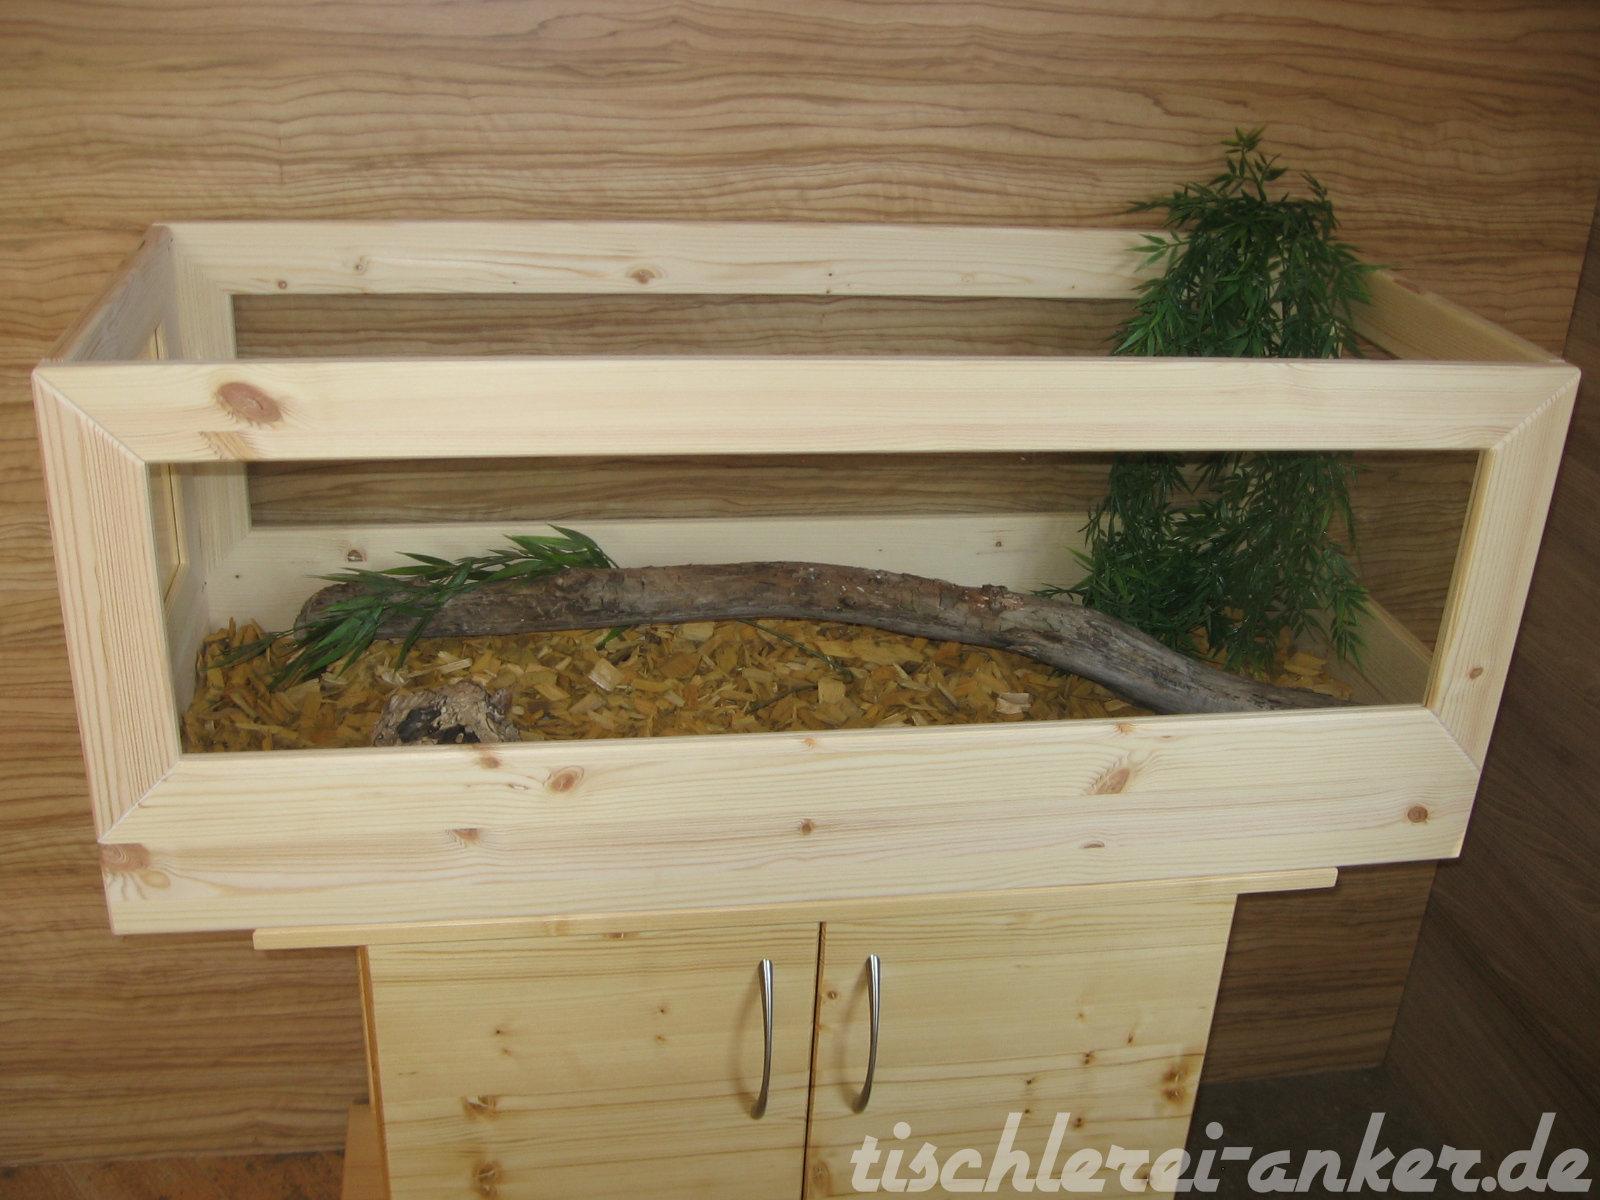 schildkr ten terrarium 100 40 40cm aus holz landschildkr ten m use terrarien erlau. Black Bedroom Furniture Sets. Home Design Ideas